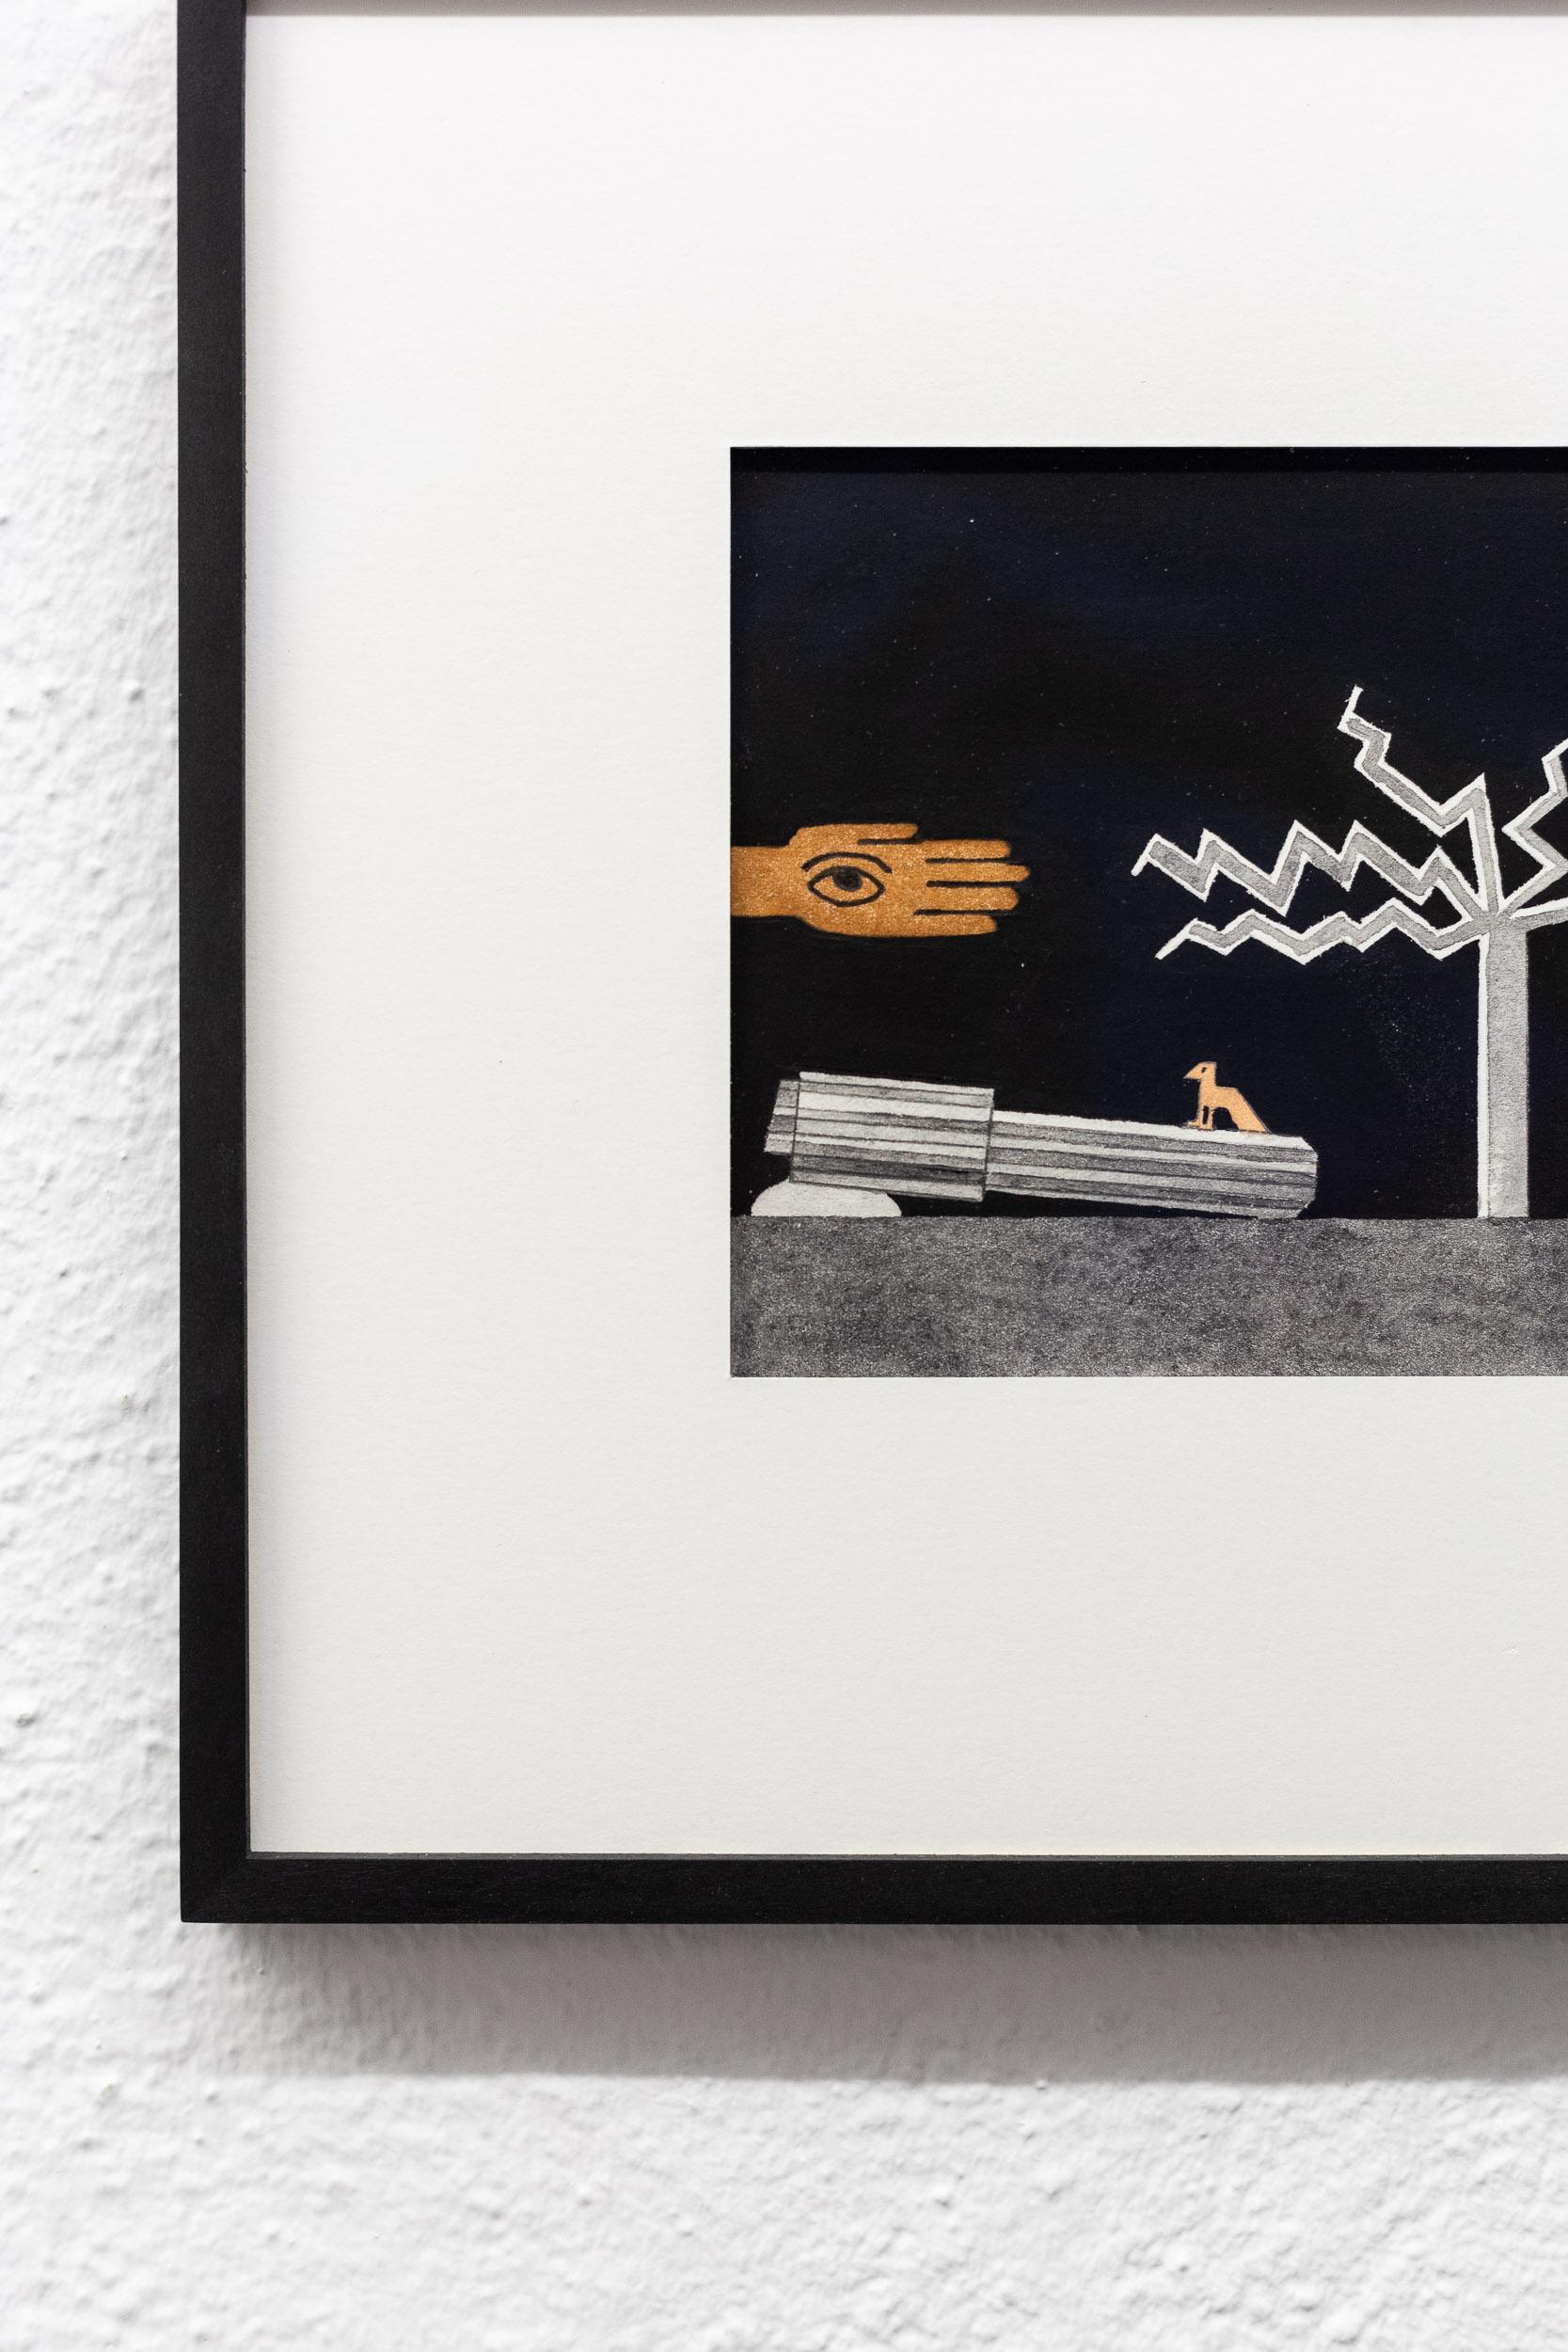 Patricia Bucher,  Untitled  (series) (detail), 2018, aquarelle and linoprint on paper, each 20.9 x 28.2 cm  Photo: Kilian Bannwart